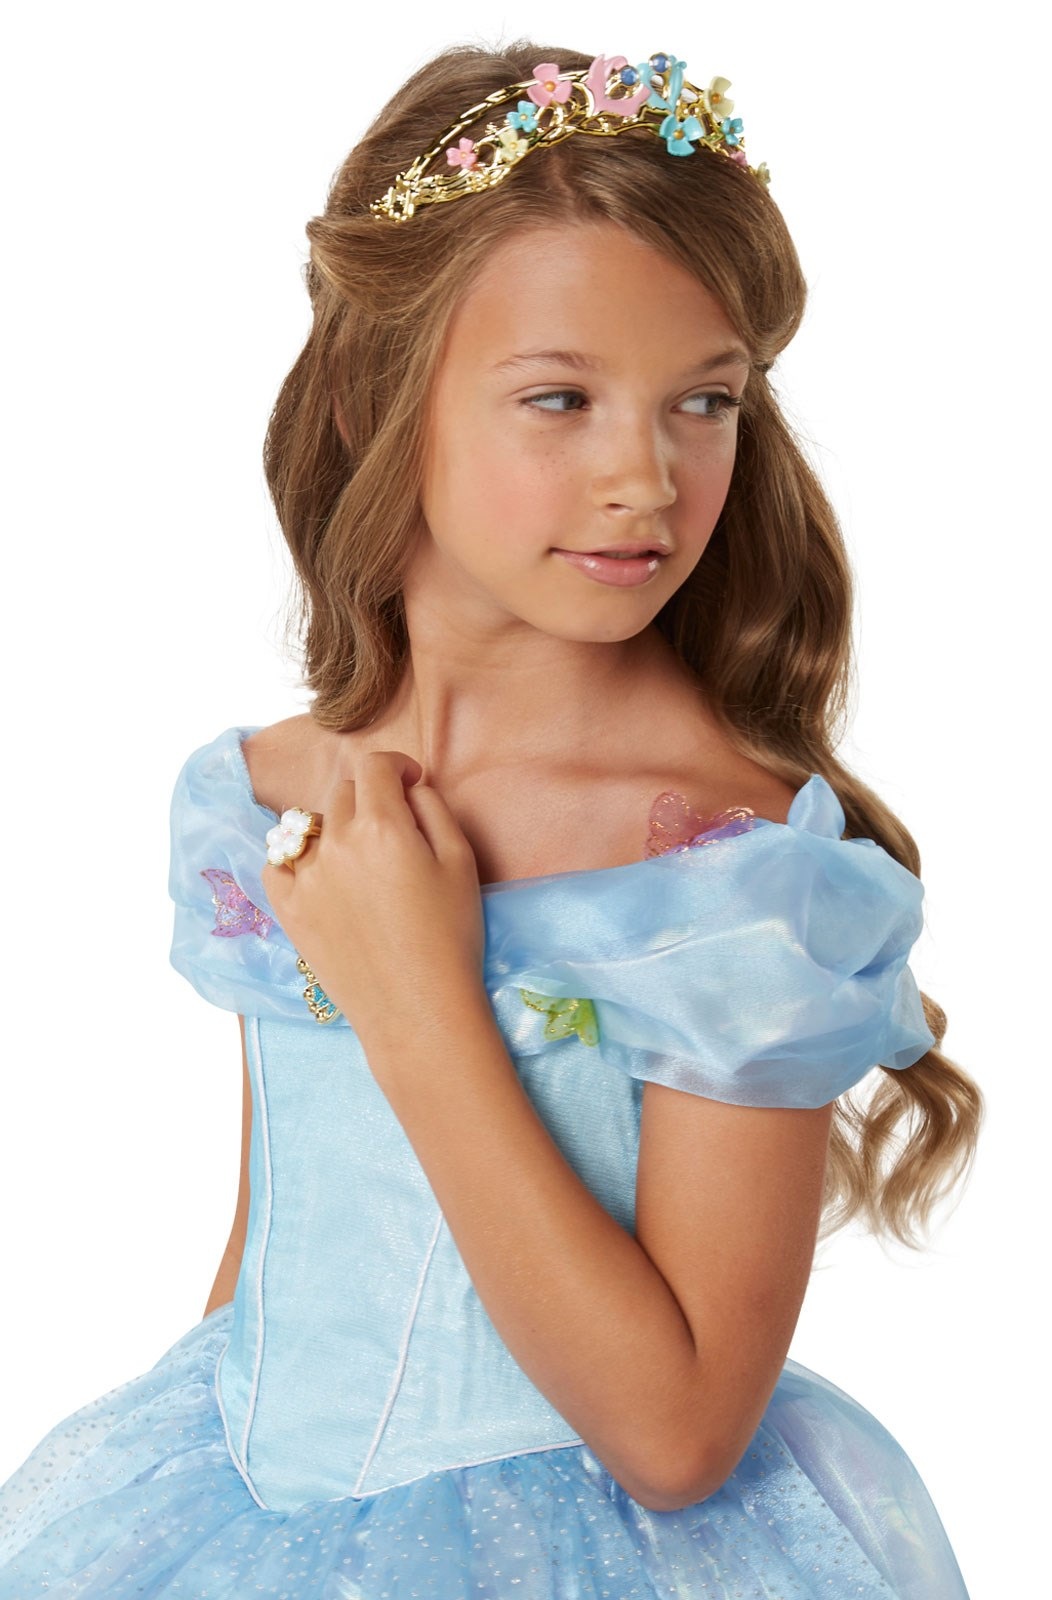 Disney Cinderella Movie: Celebration Wedding Ring & Tiara